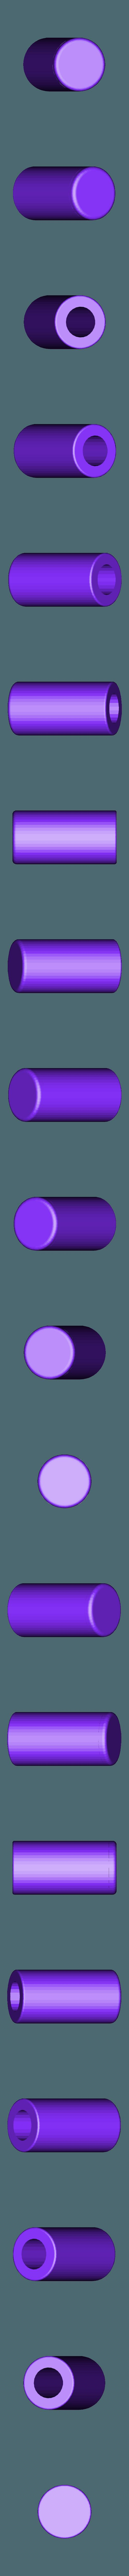 lever_Taranis.stl Download free STL file Taranis lever Filaflex • Object to 3D print, touchthebitum